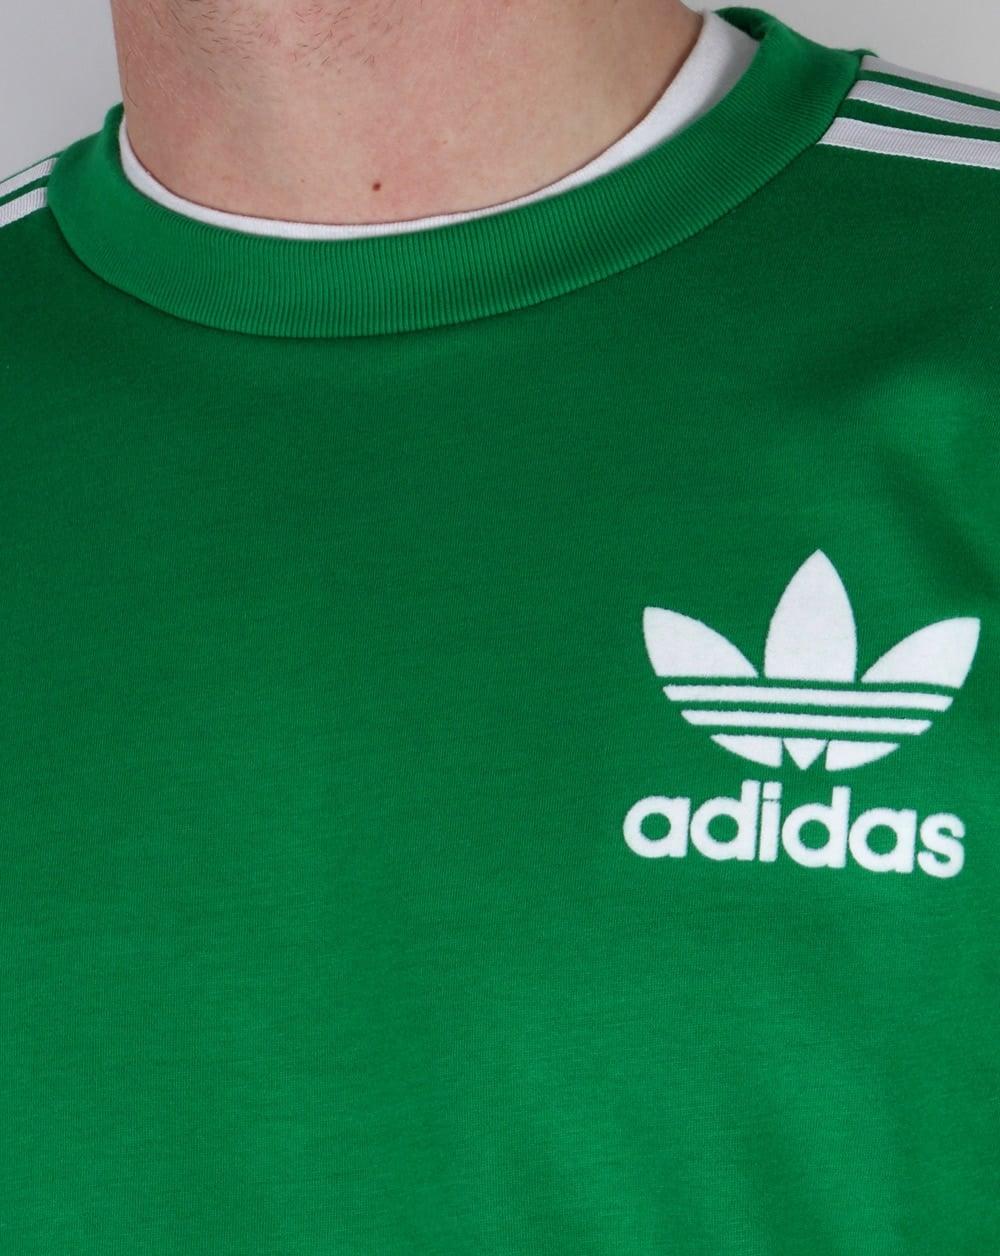 Adicolour Sweatshirt Greenwhite Originals Originals Adidas Adidas Adicolour HIEWD29